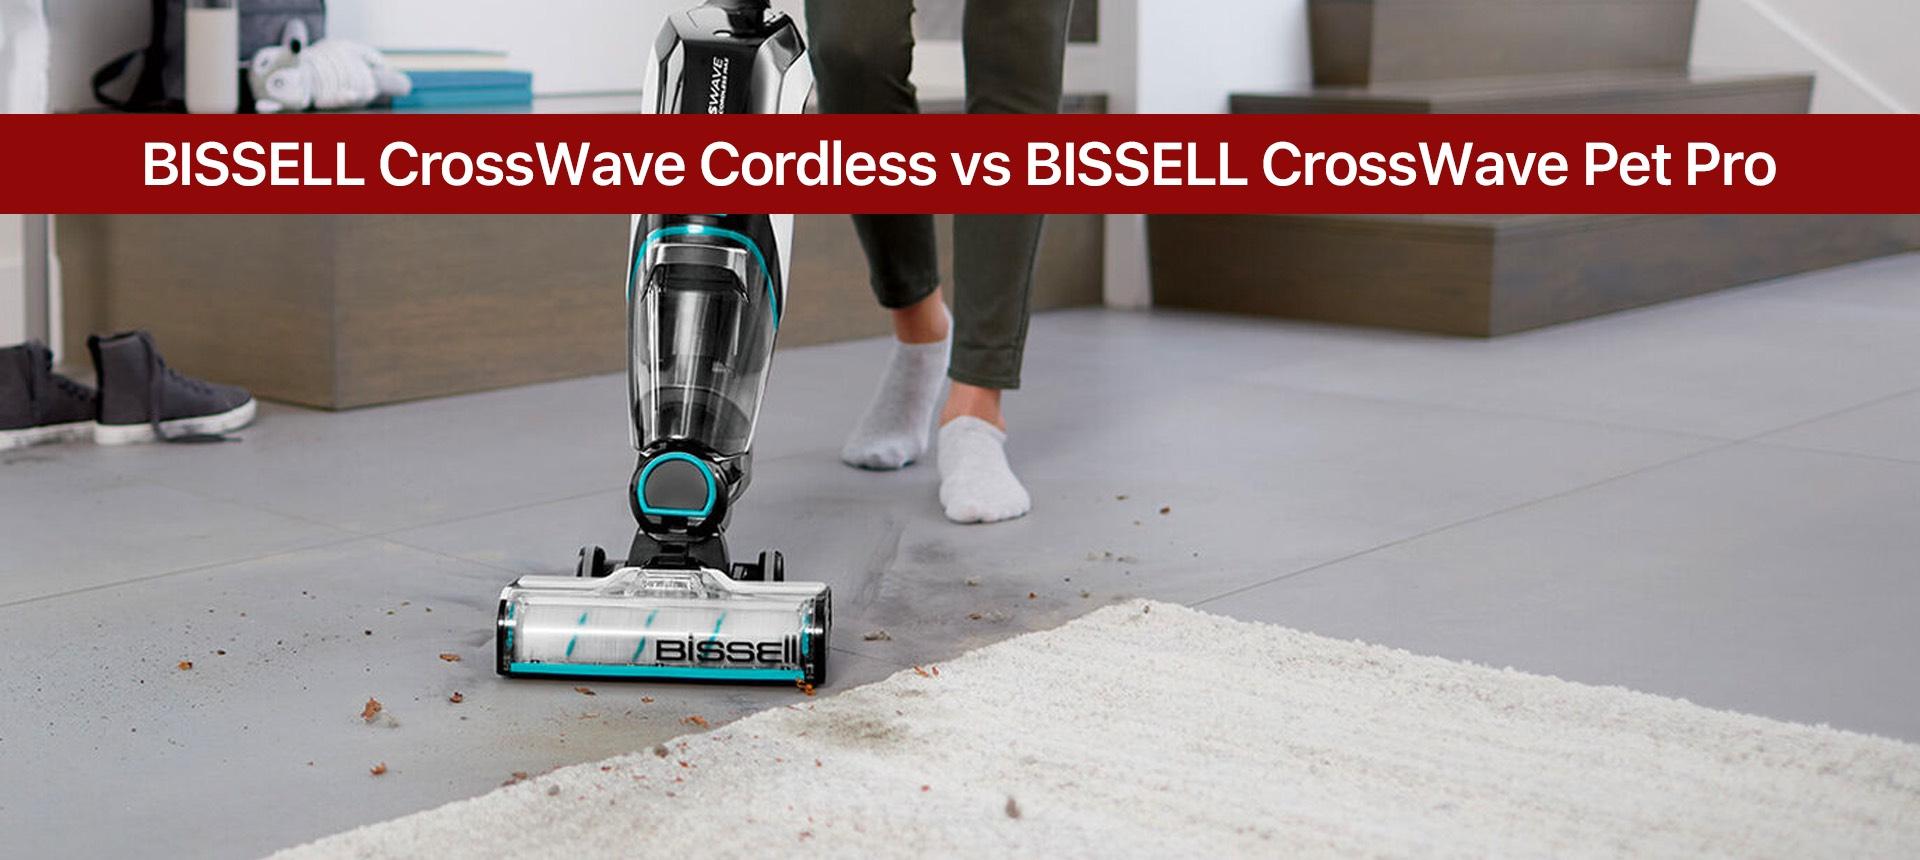 BISSELL CrossWave Cordless vs BISSELL CrossWave Pet Pro